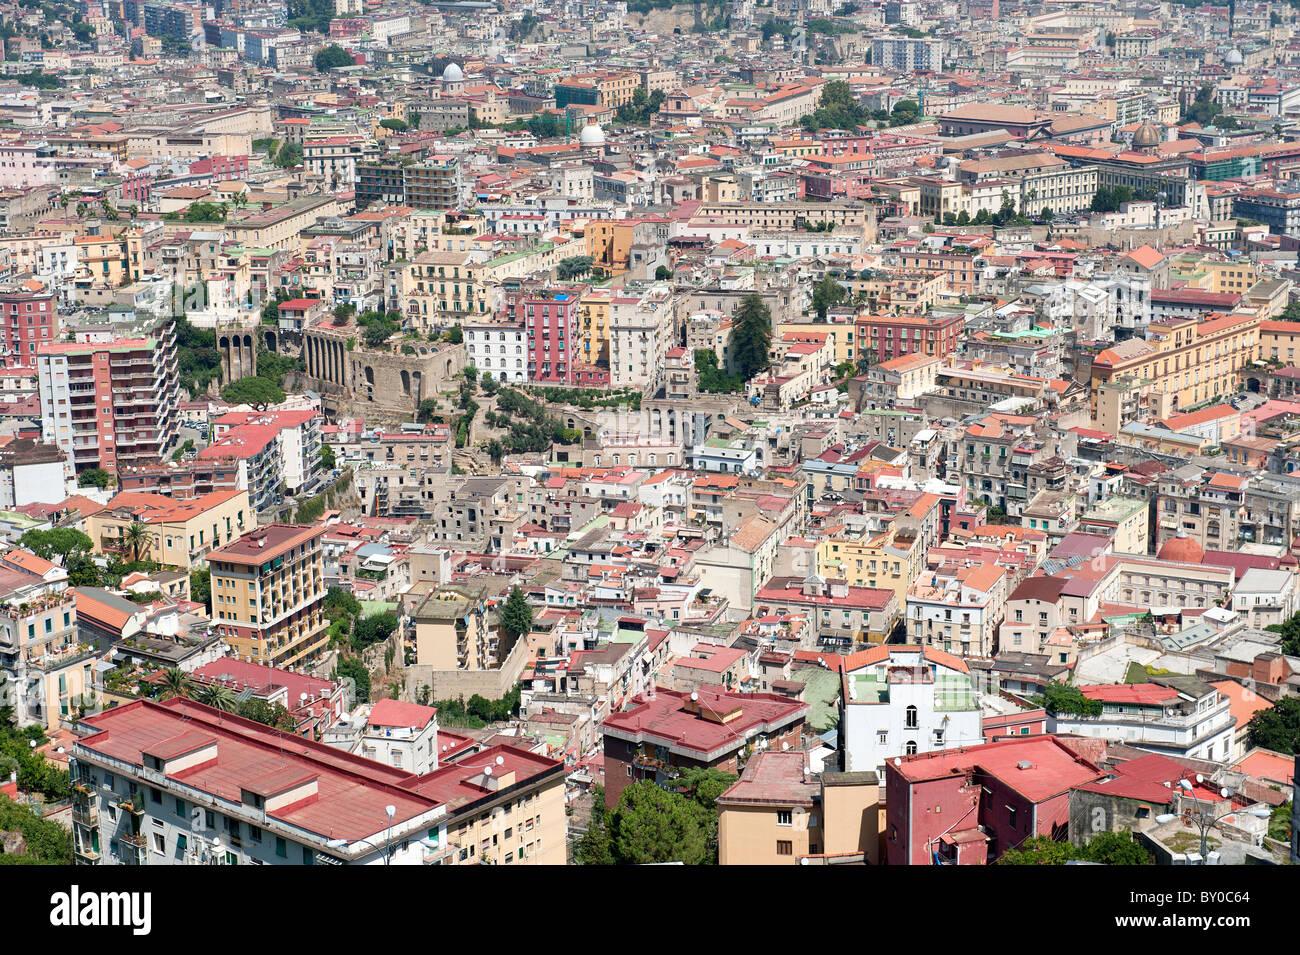 City Overview Naples Campania Italy - Stock Image